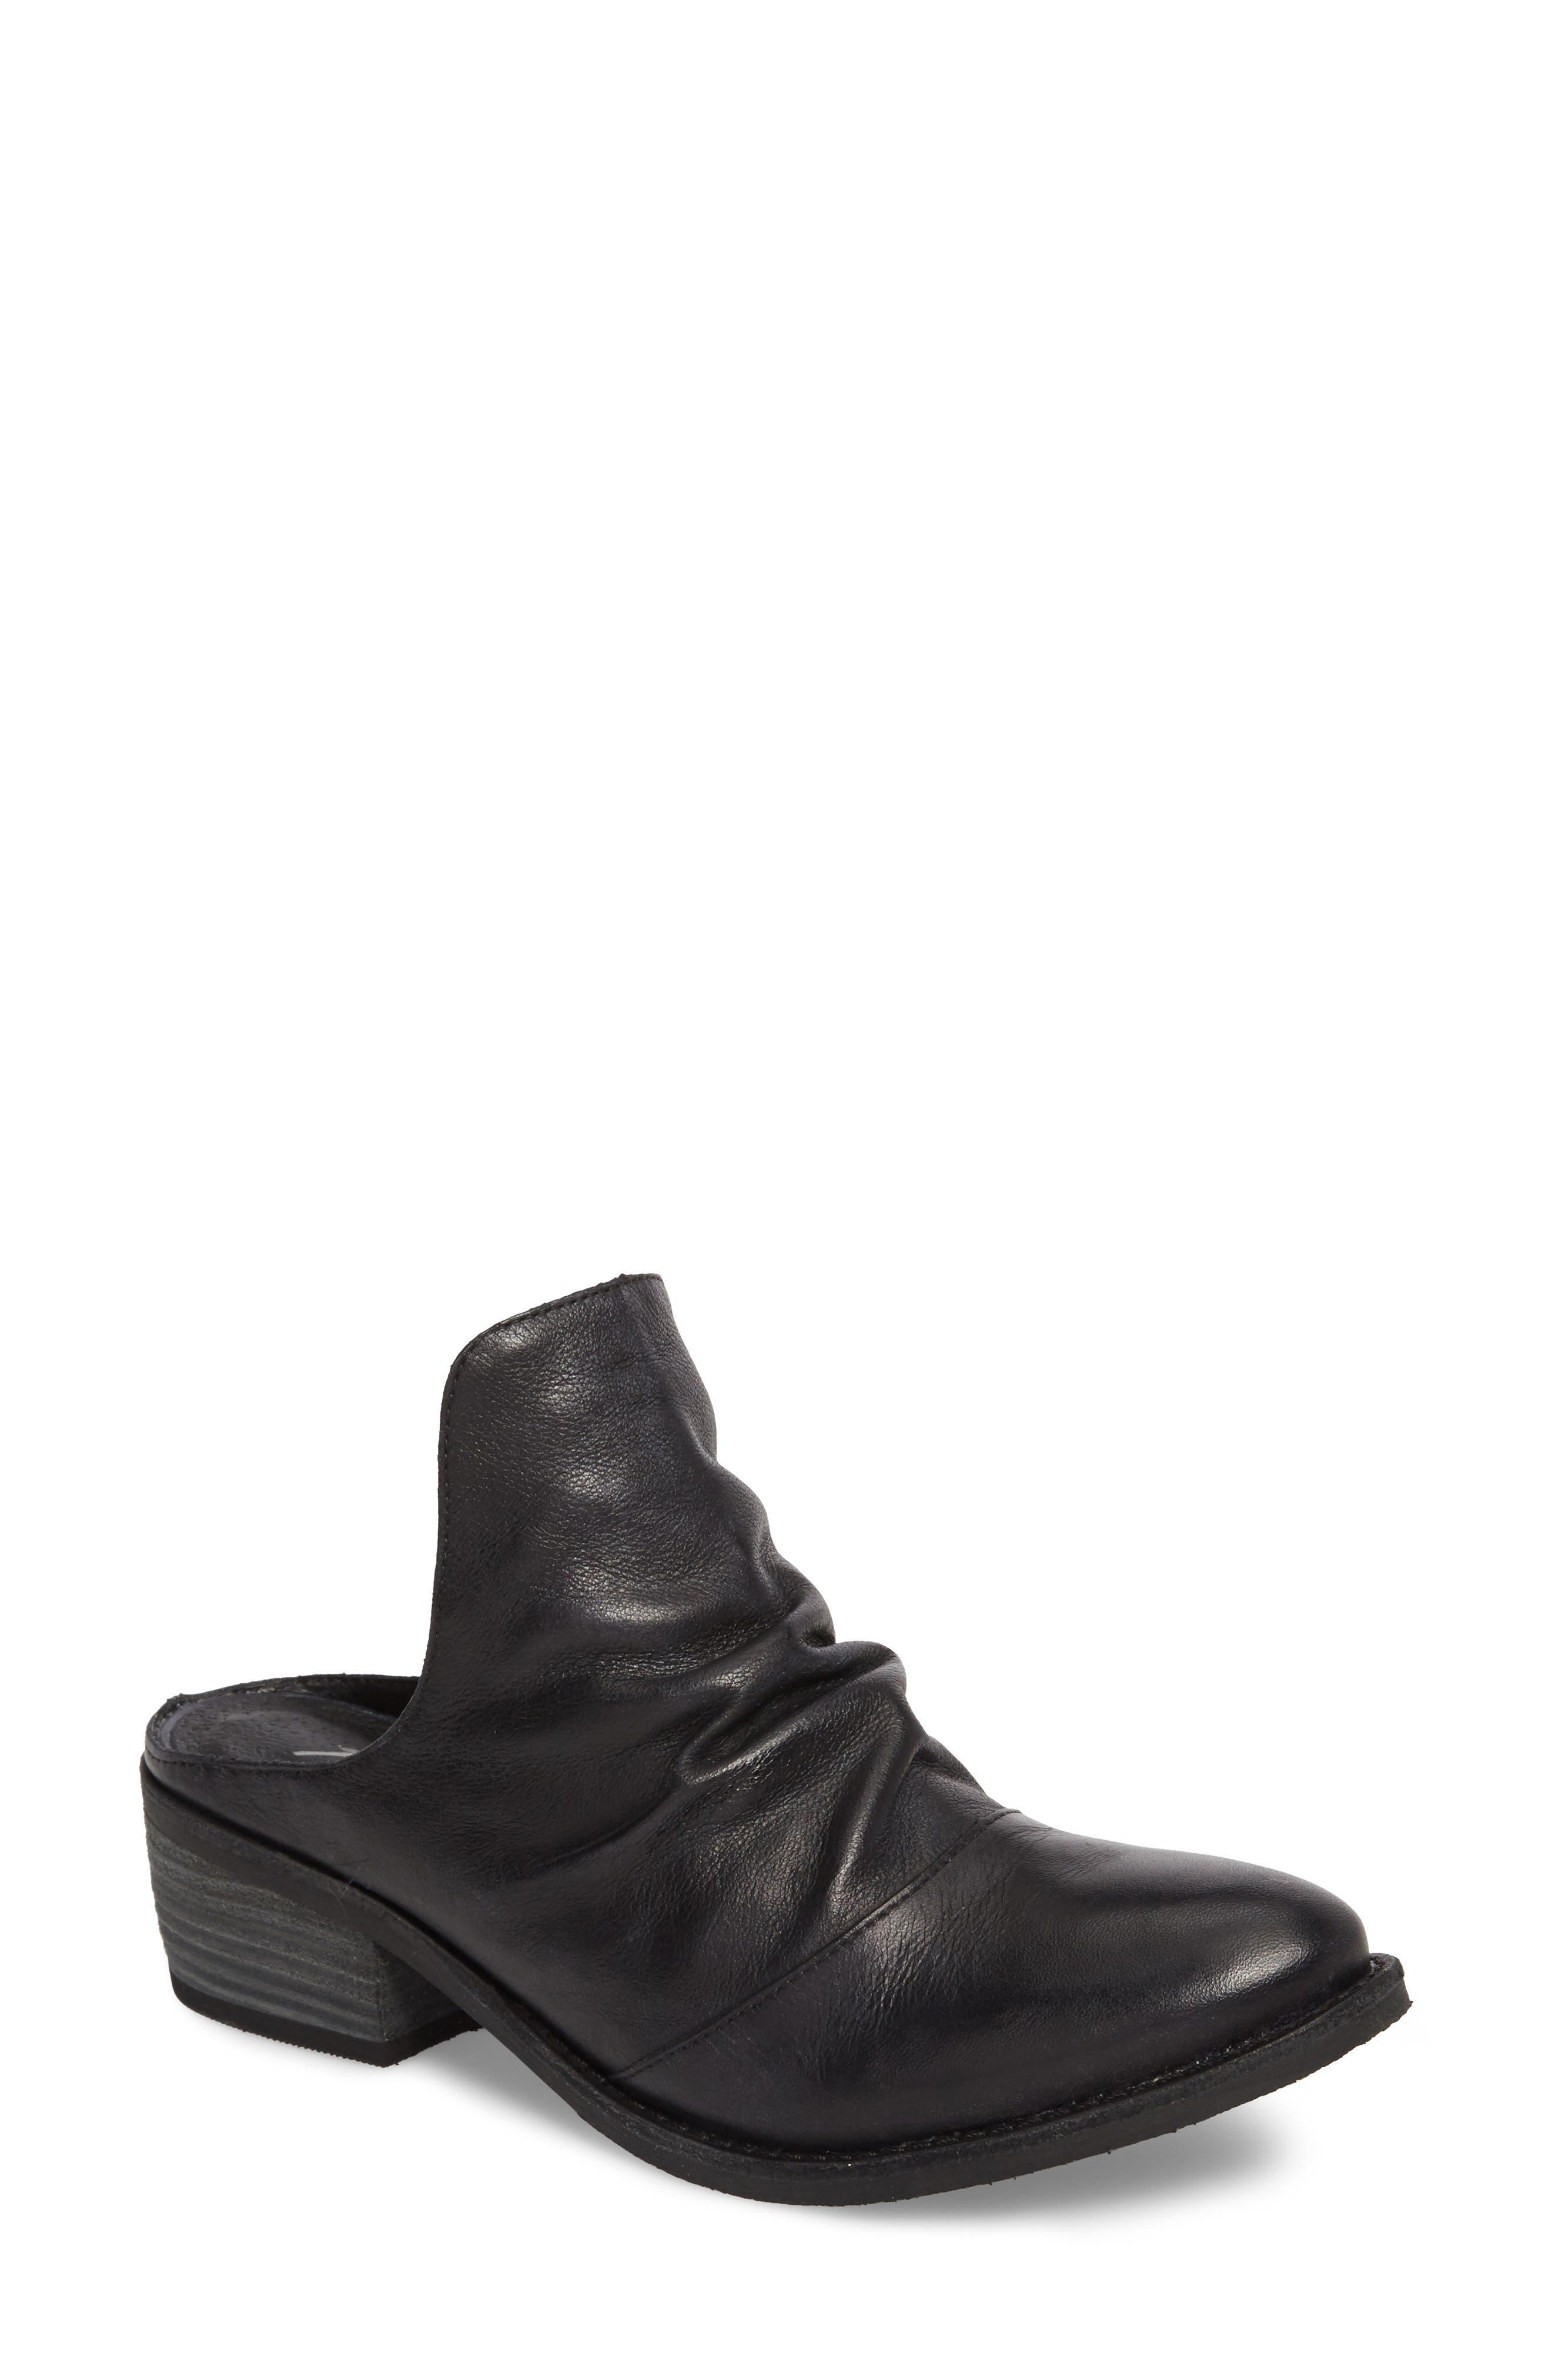 Augustine Mule,                         Main,                         color, Black Leather